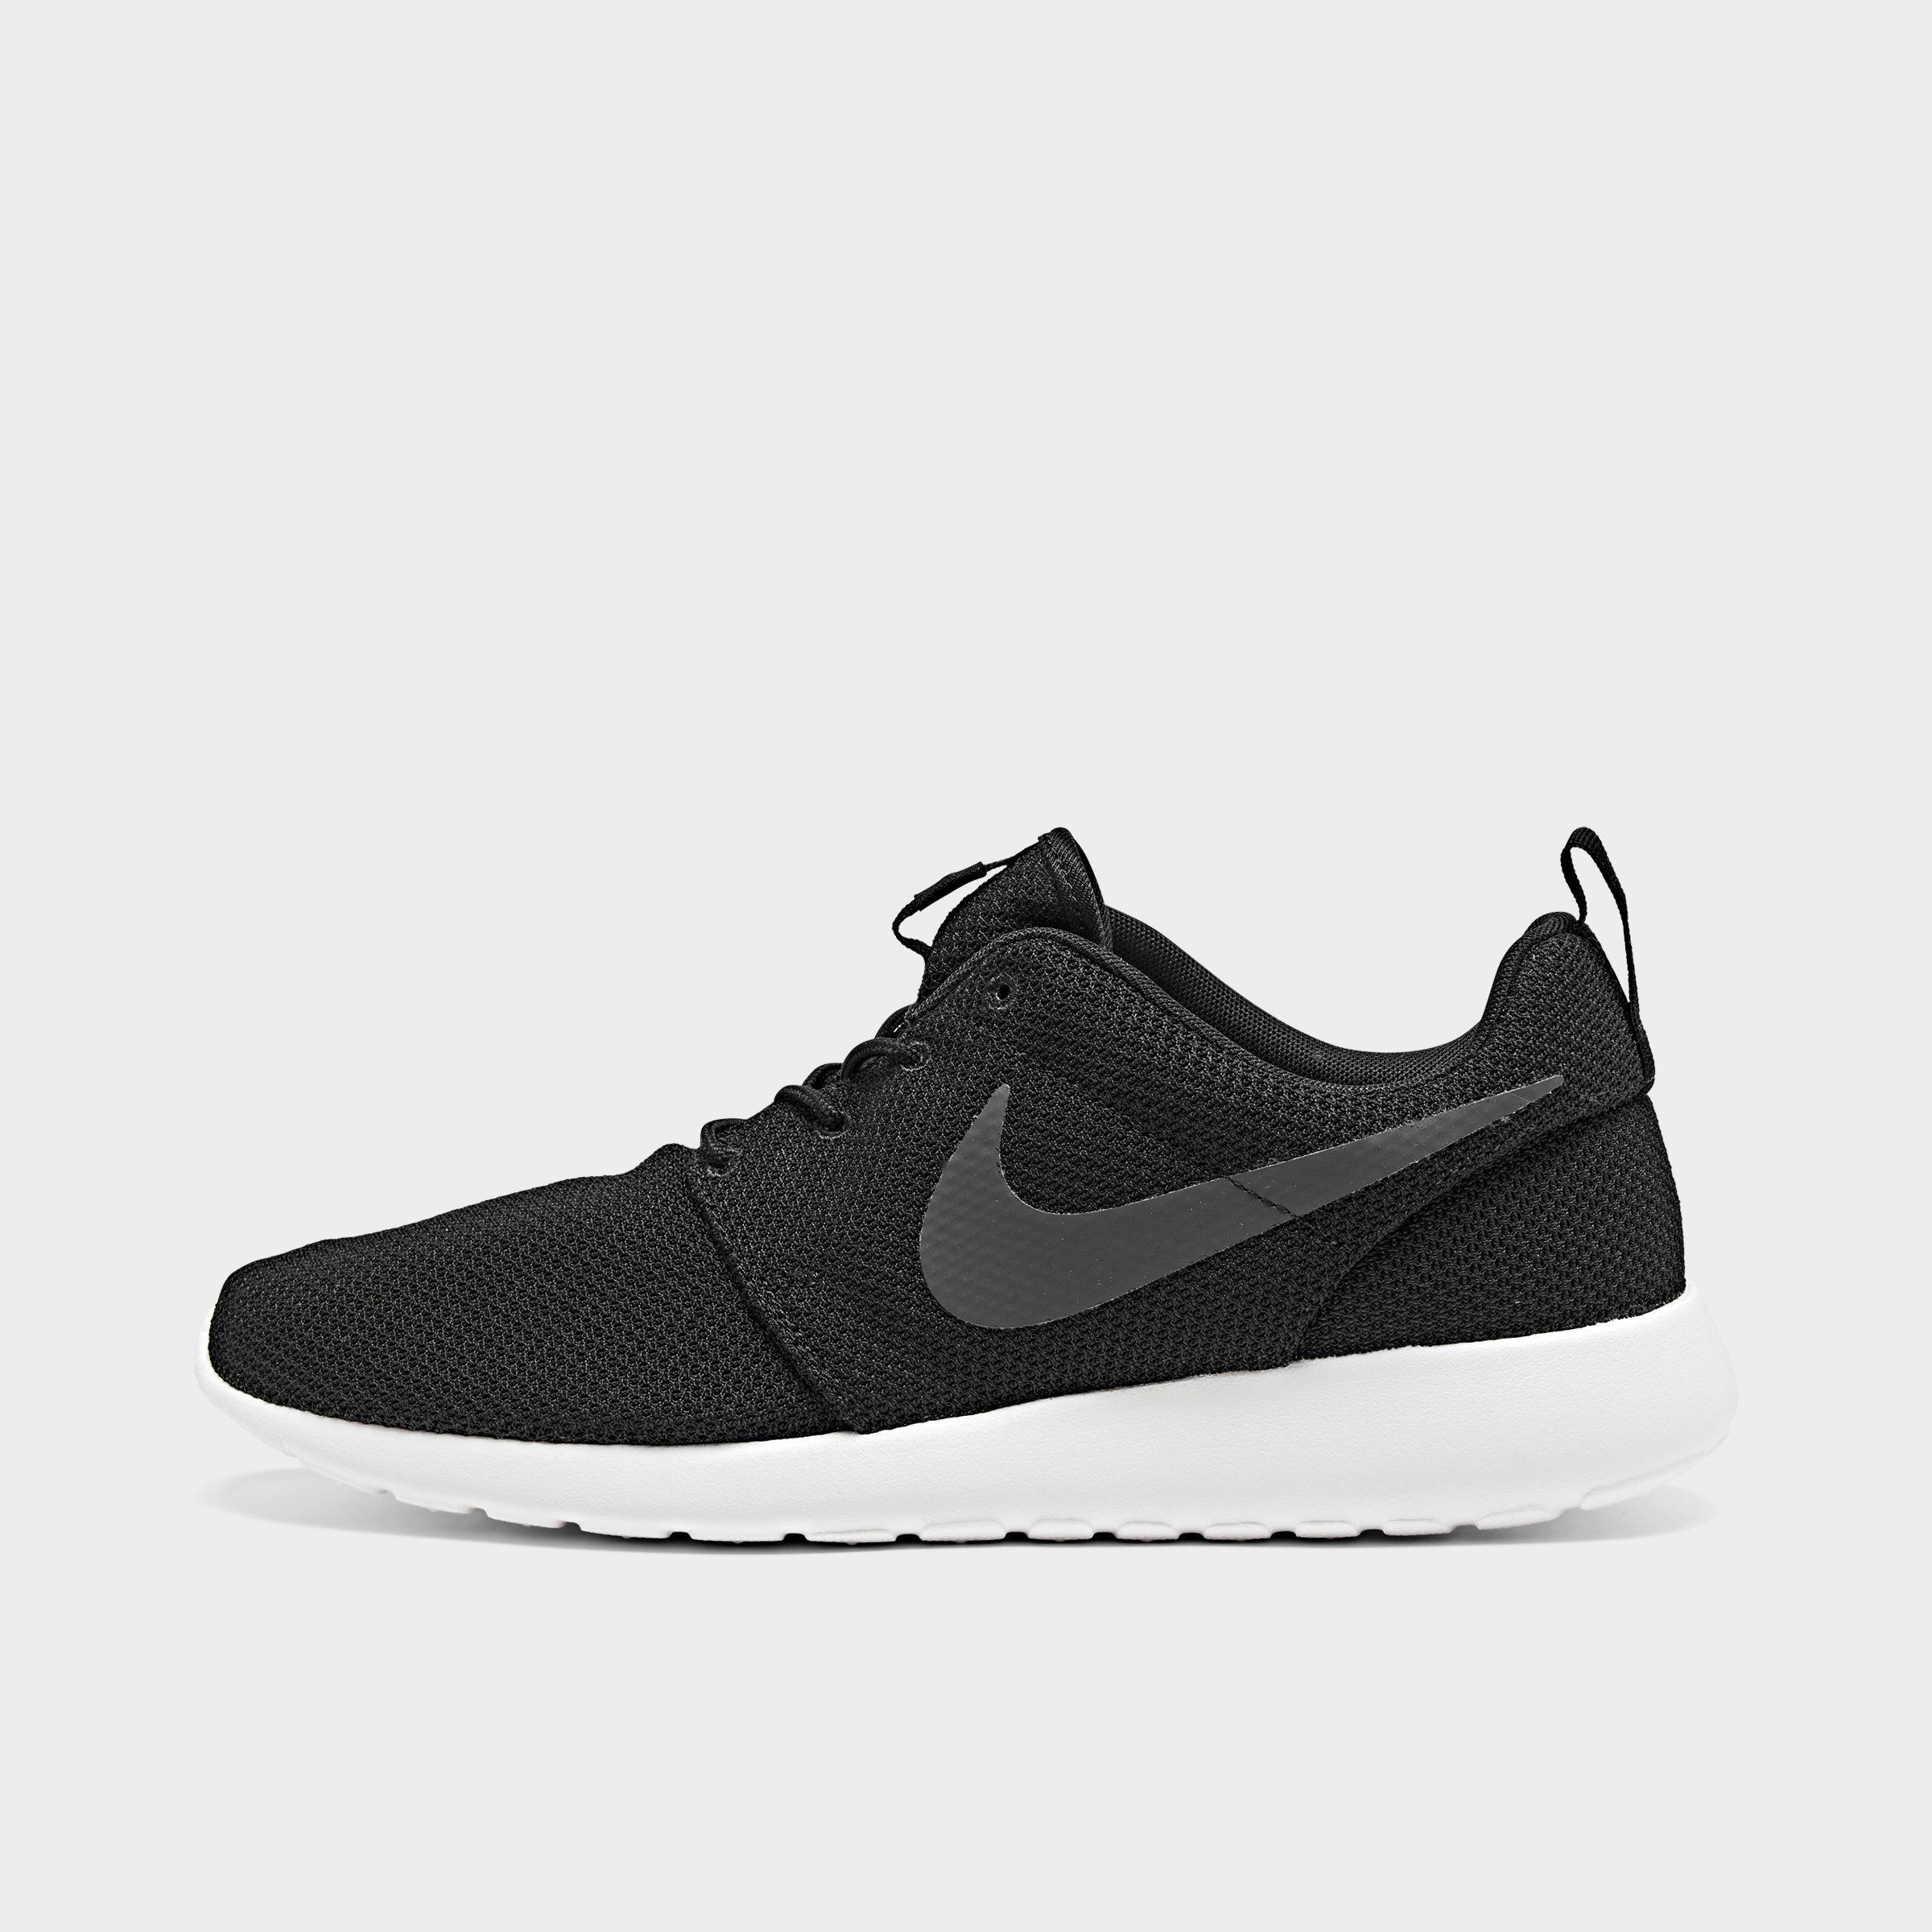 nike roshe one mens shoes